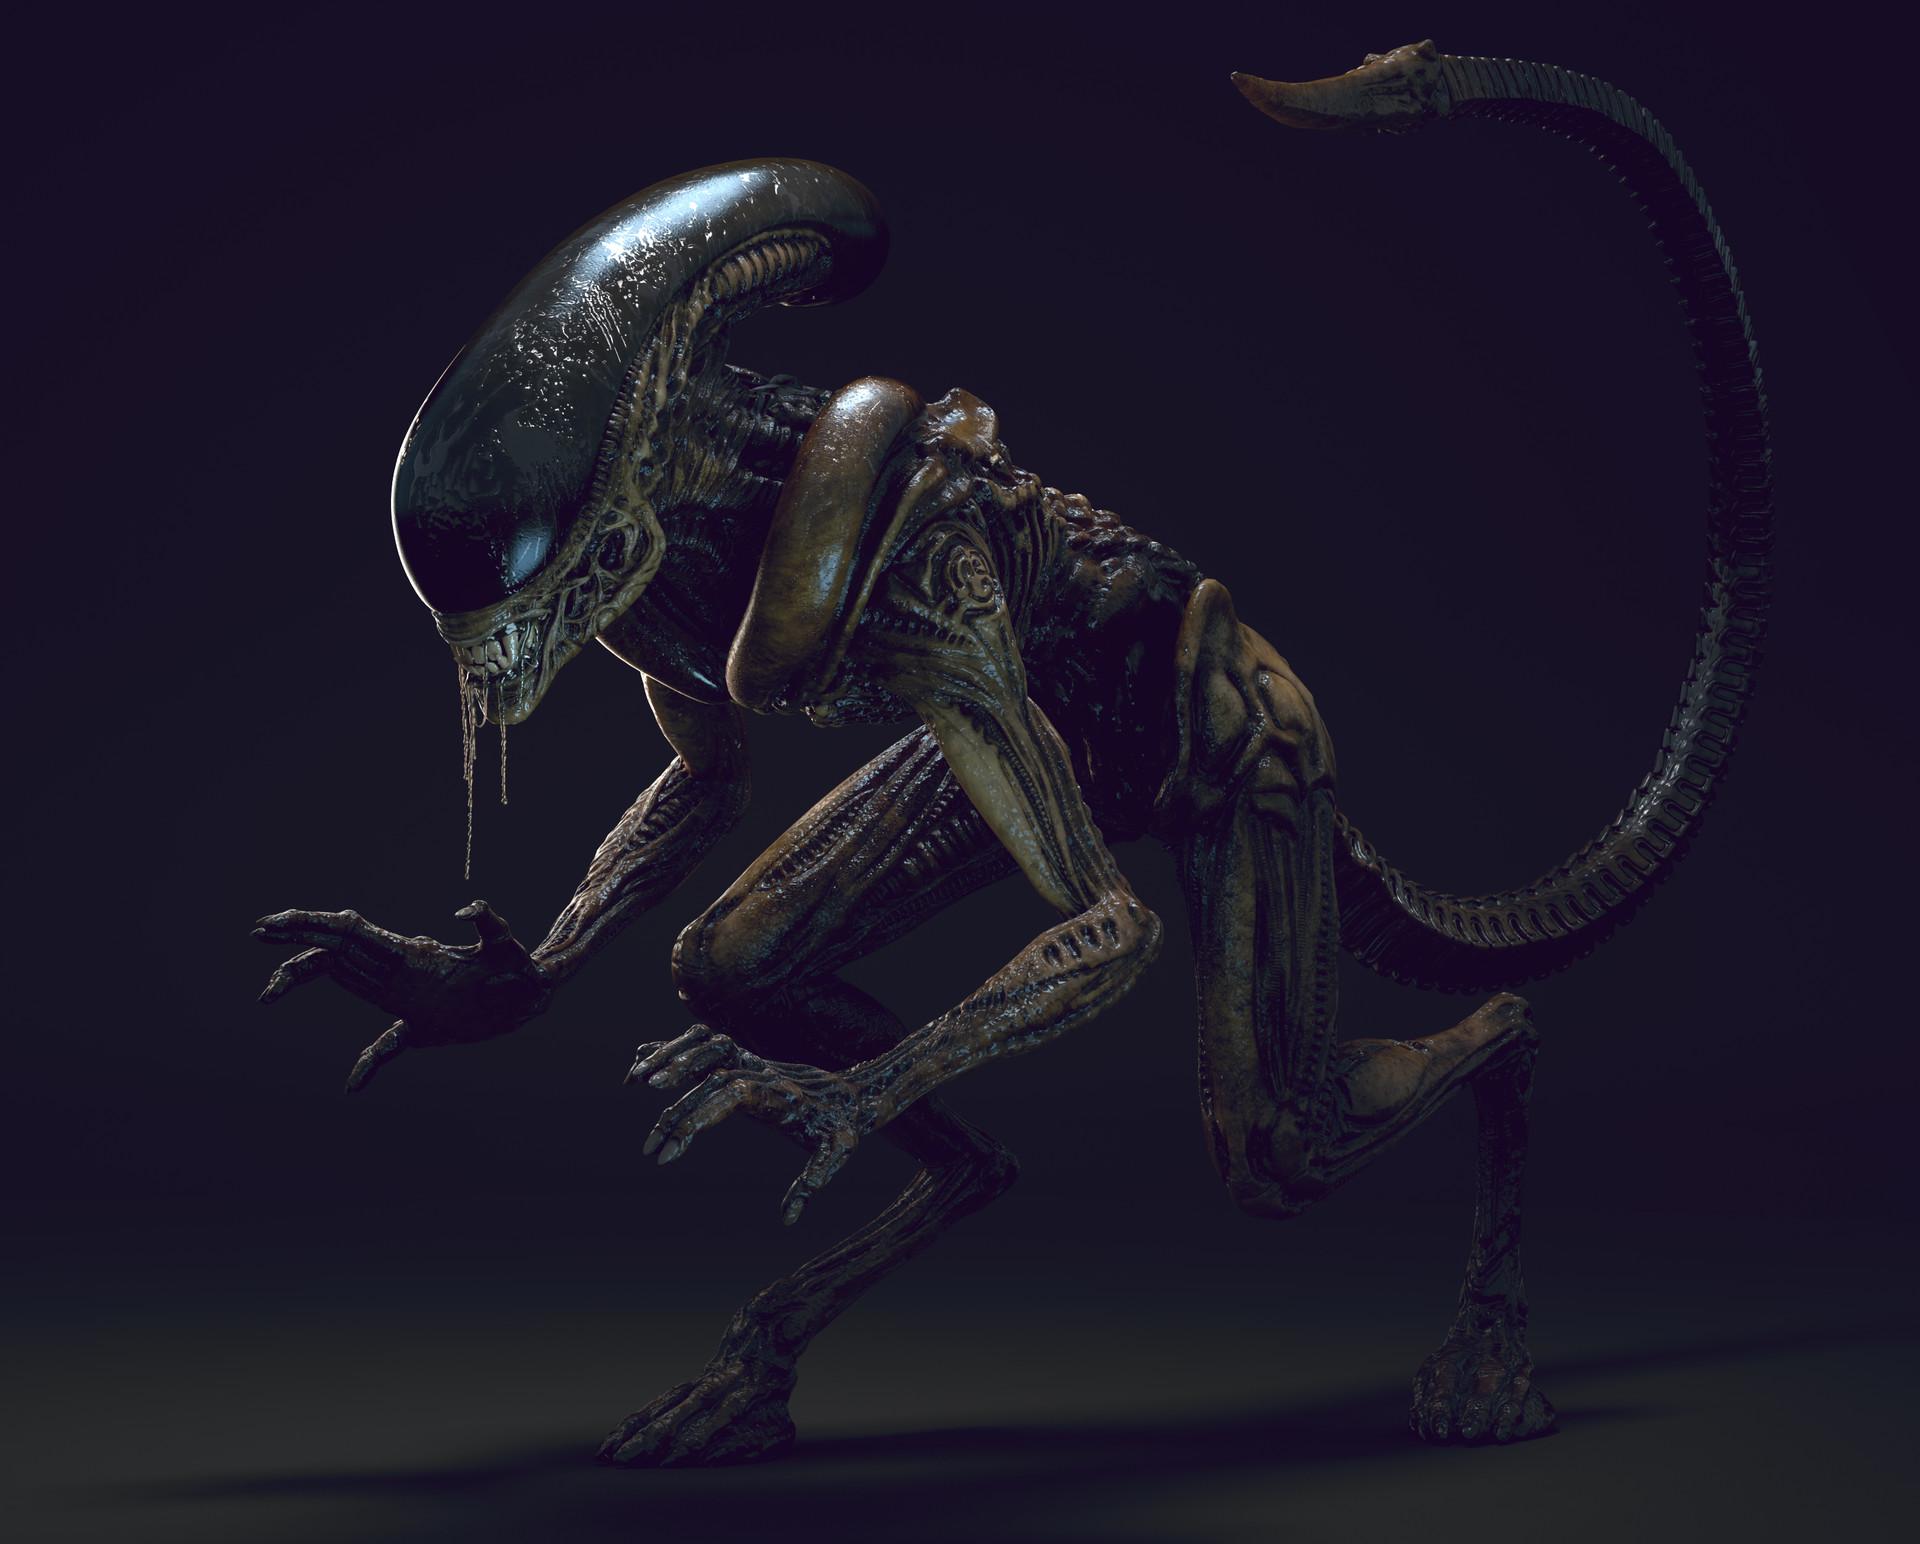 ArtStation - Alien runner, Alex Vasin